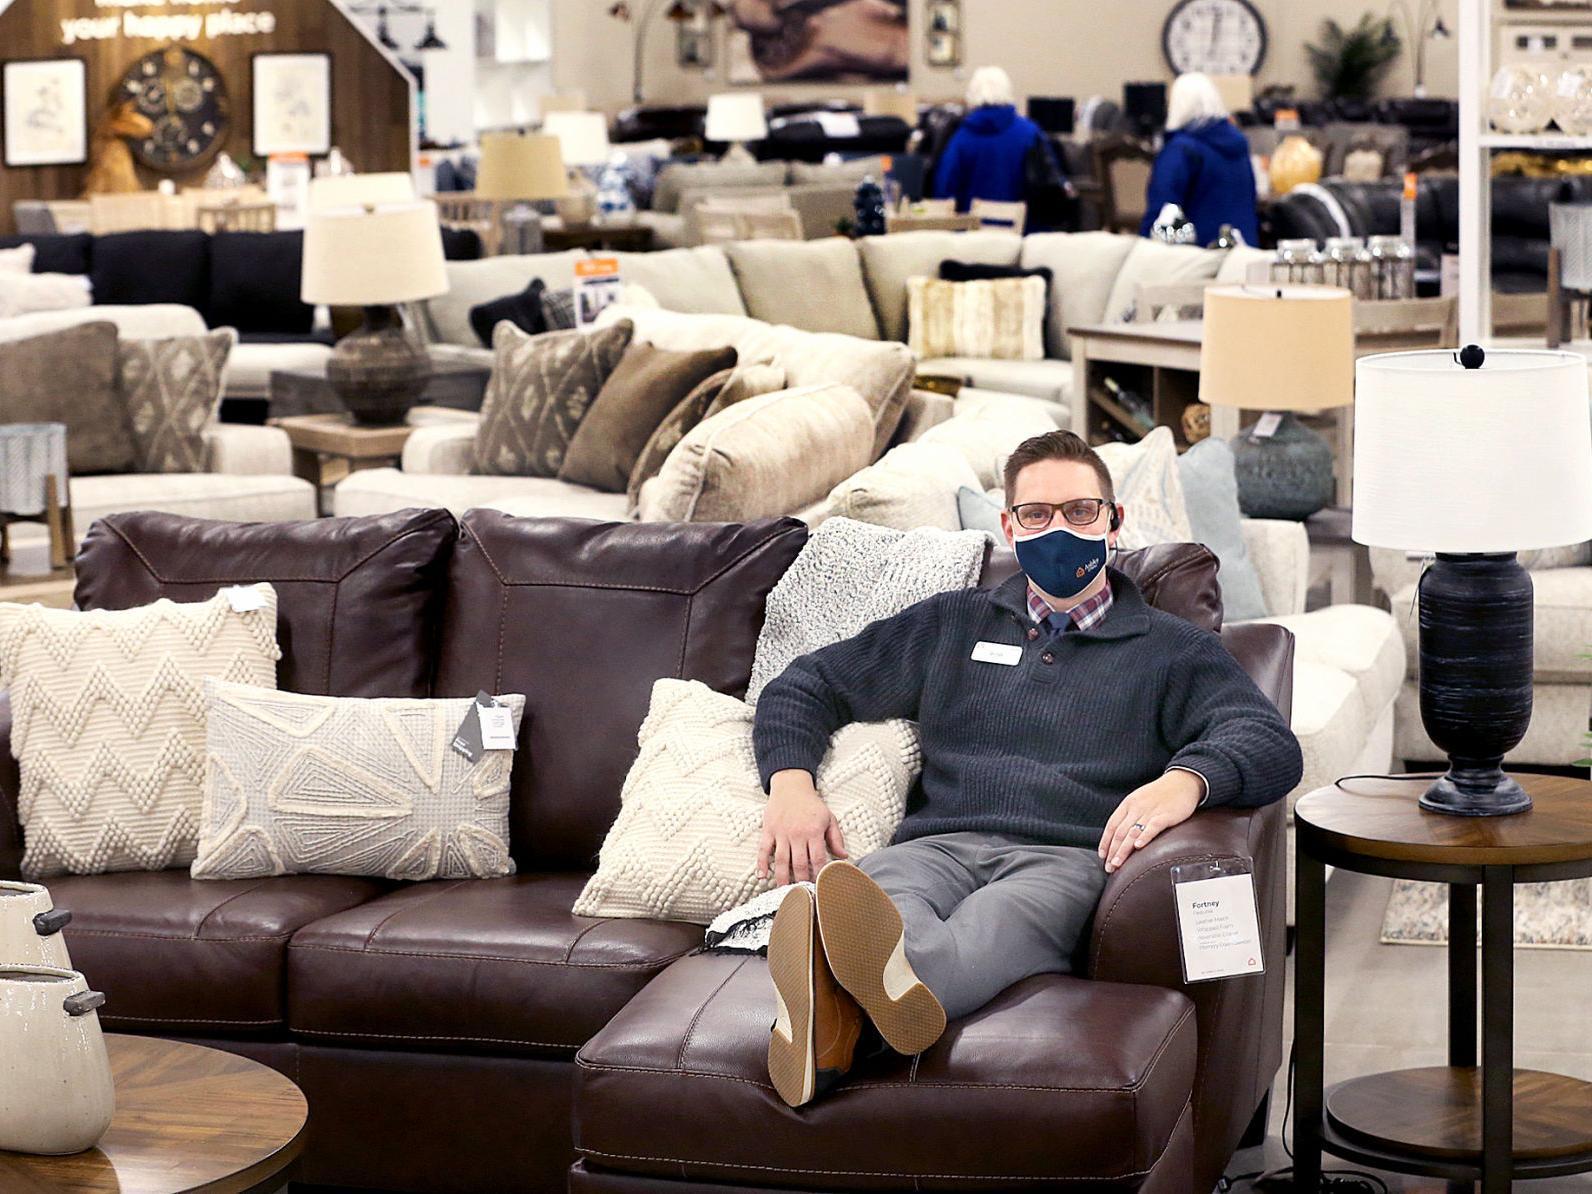 Ashley Furniture Homestore Opens In Former Toys R Us In Onalaska Business Lacrossetribune Com